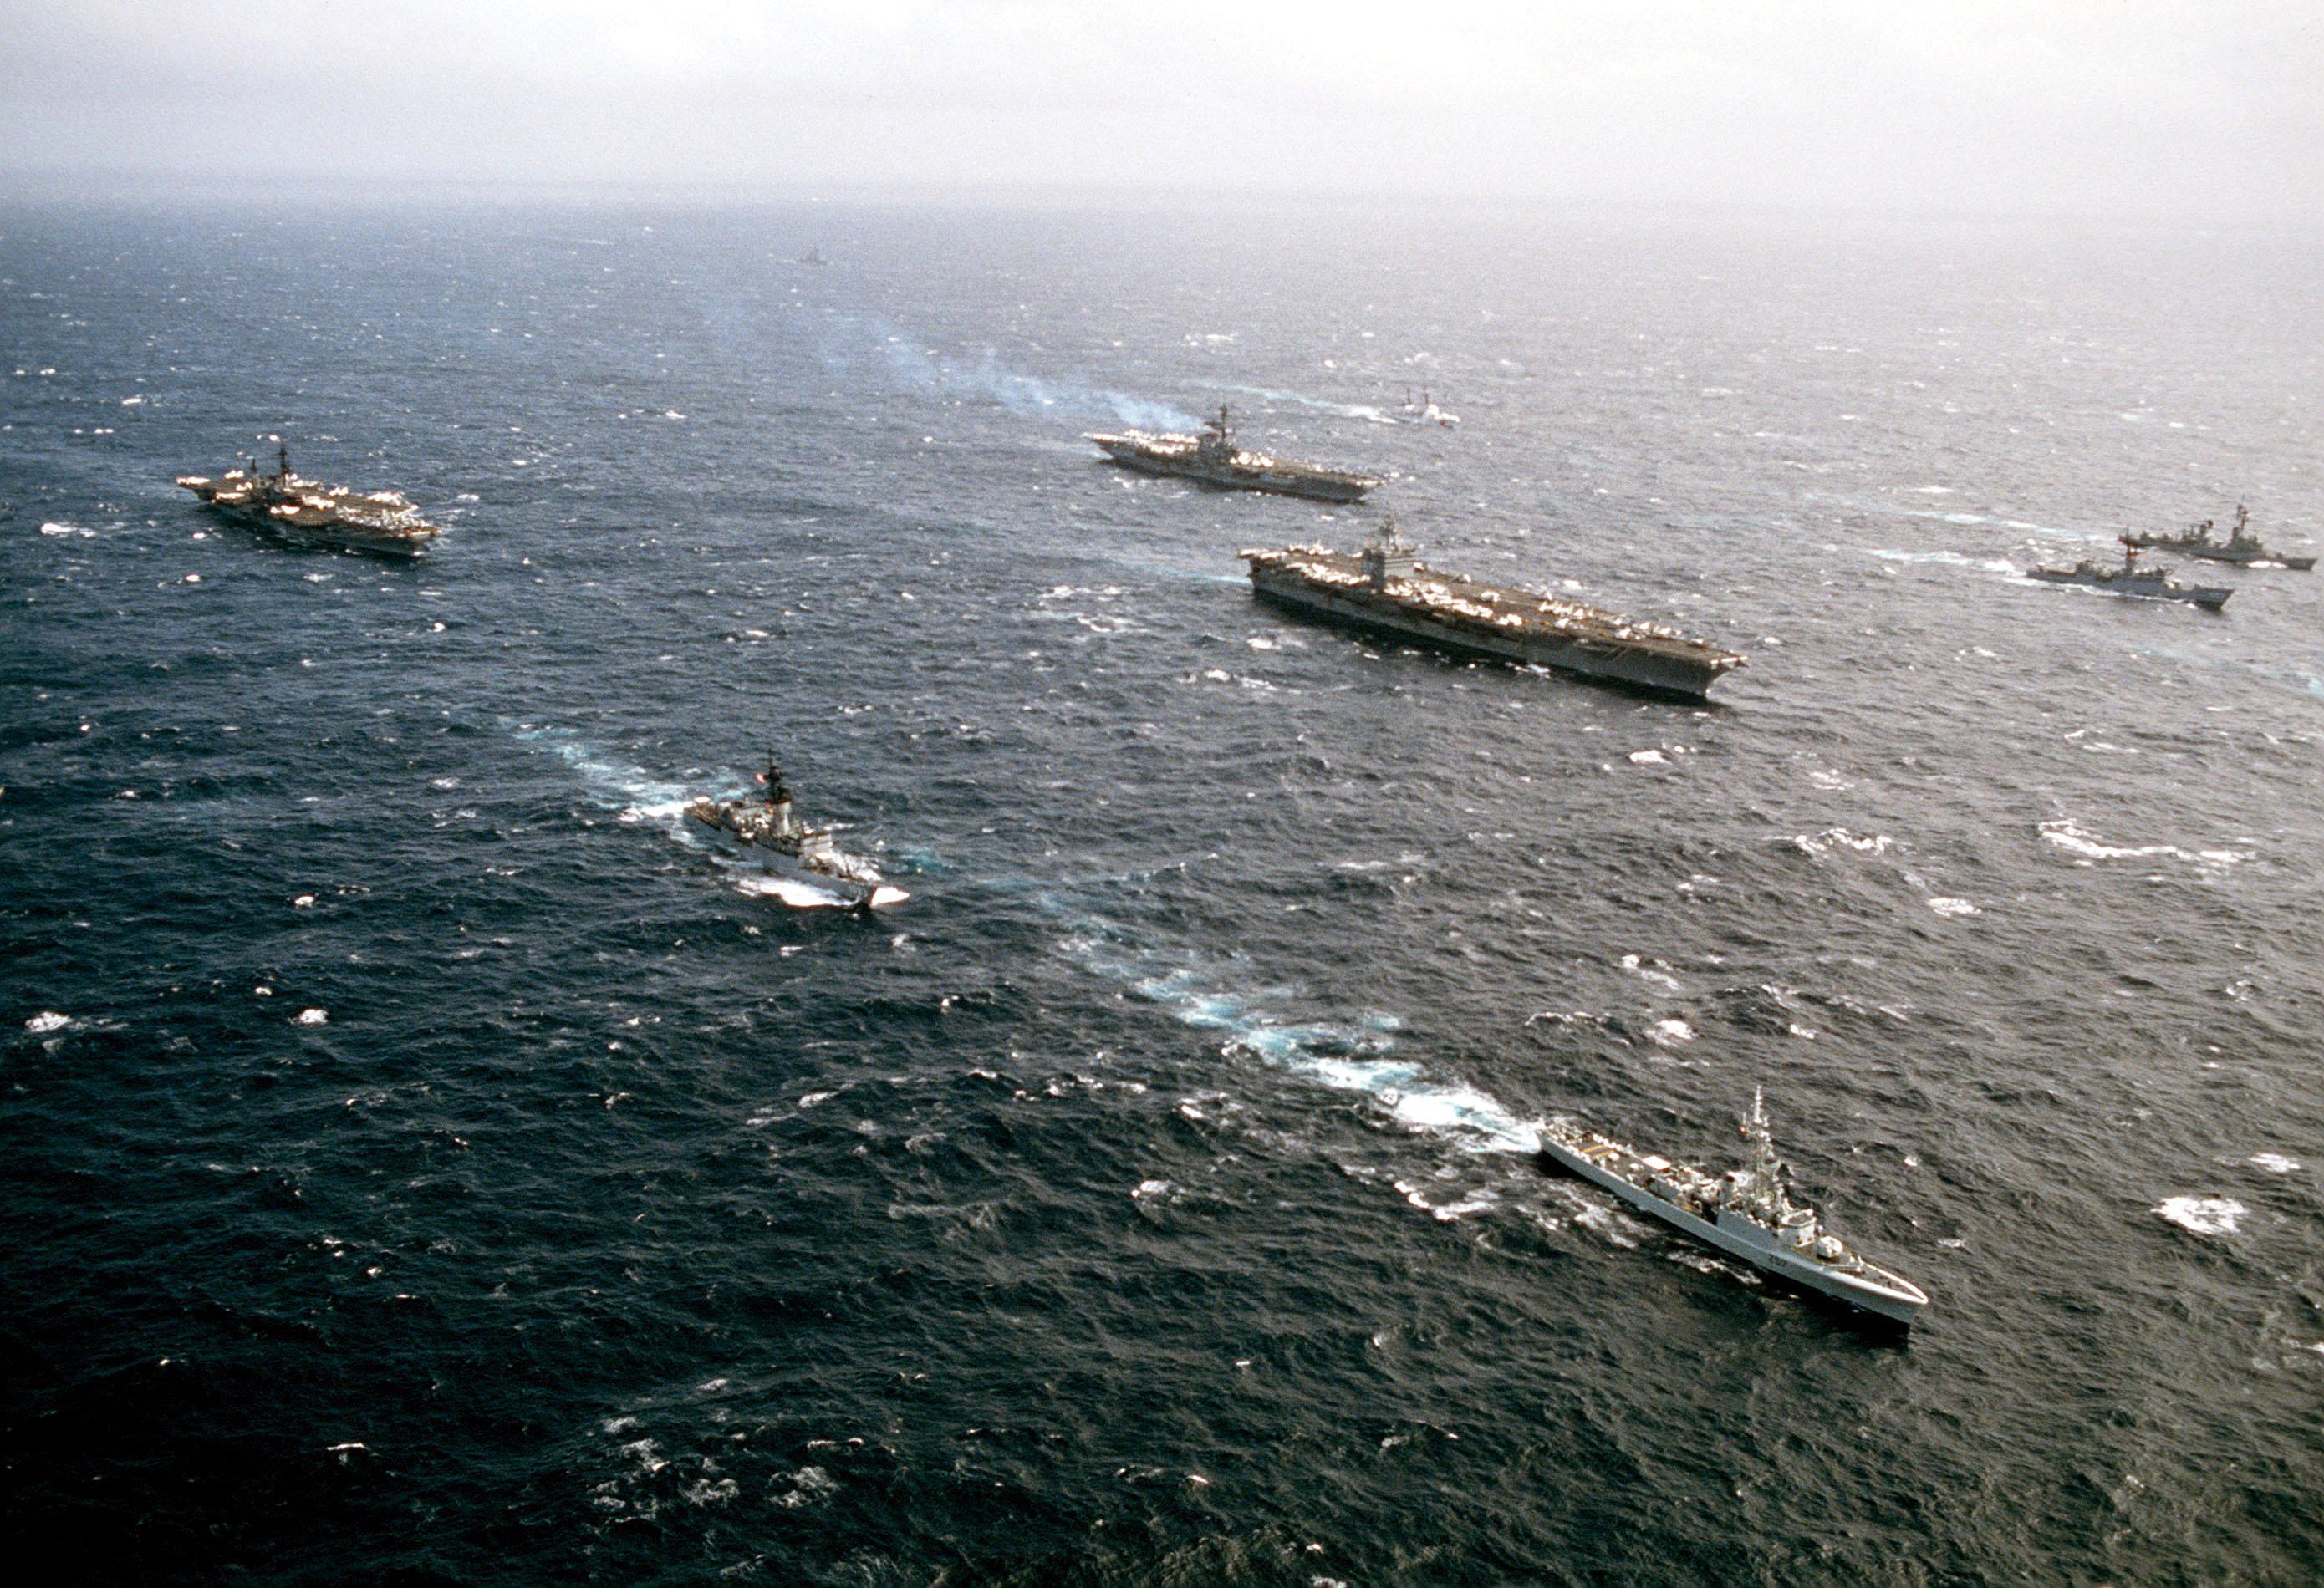 Coral Sea 43 Uss Cv Midway Uss Enterprise 65 Cv Cv 41 Uss